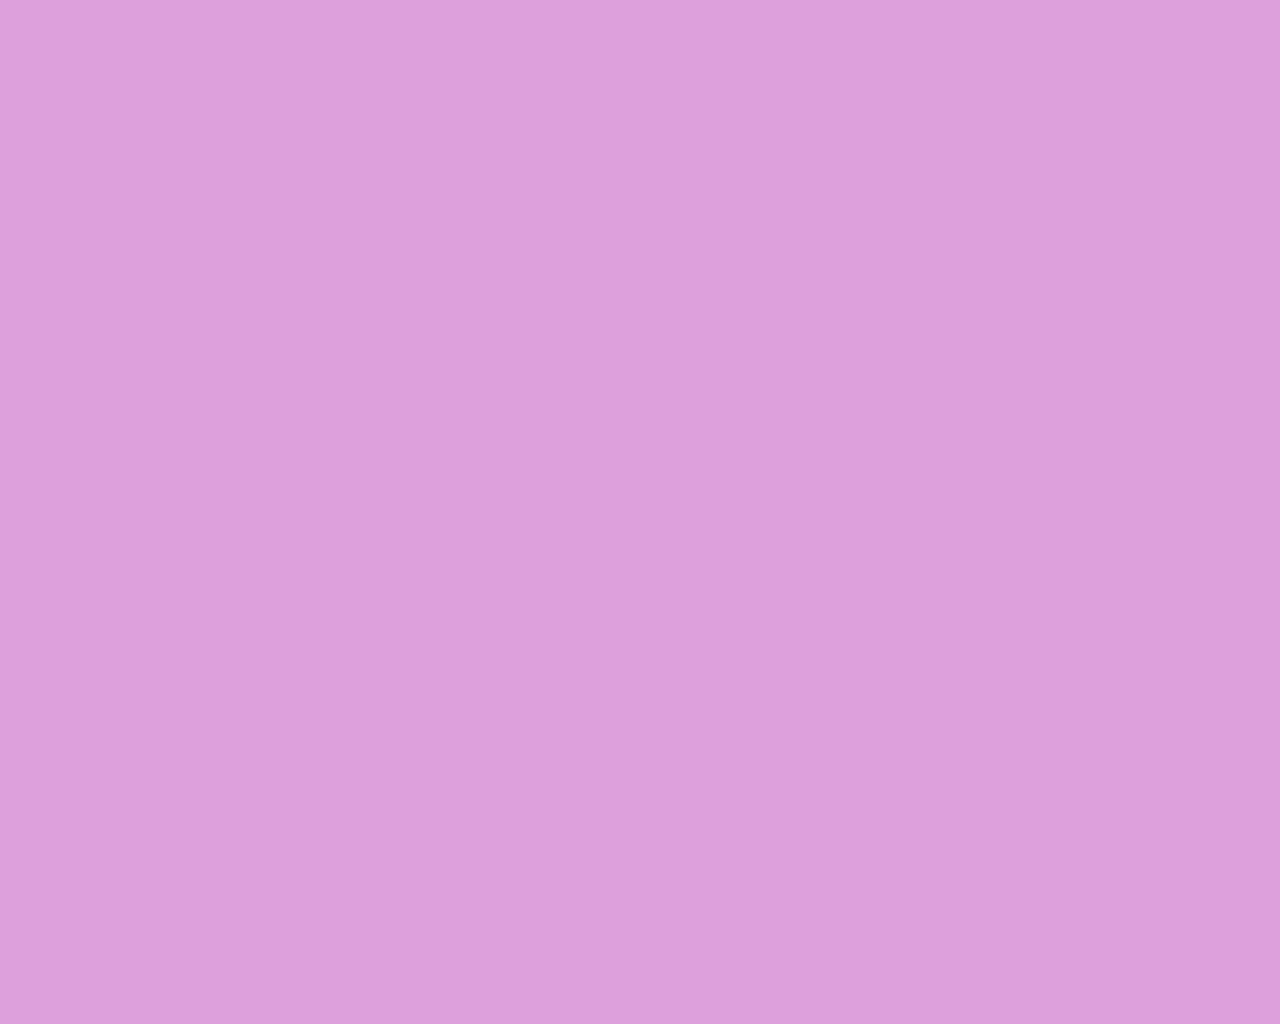 1280x1024 Medium Lavender Magenta Solid Color Background